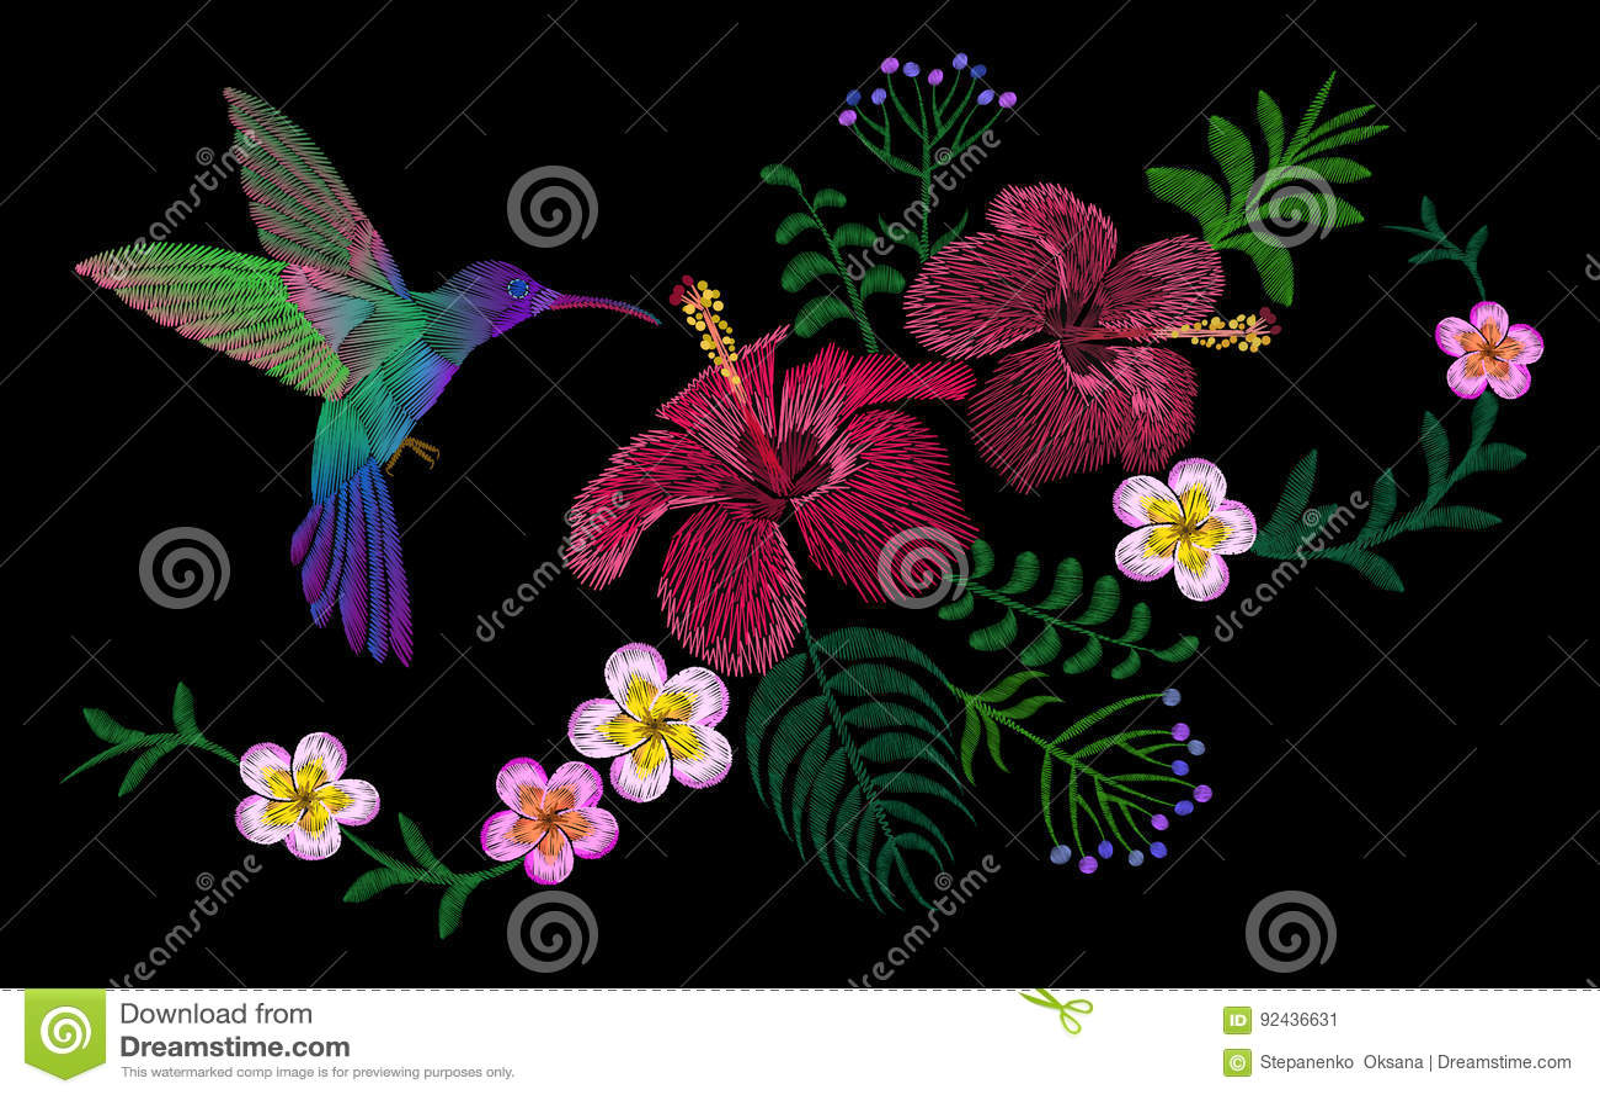 Hawaii Flower Embroidery Arrangement Patch Fashion Print Decoration